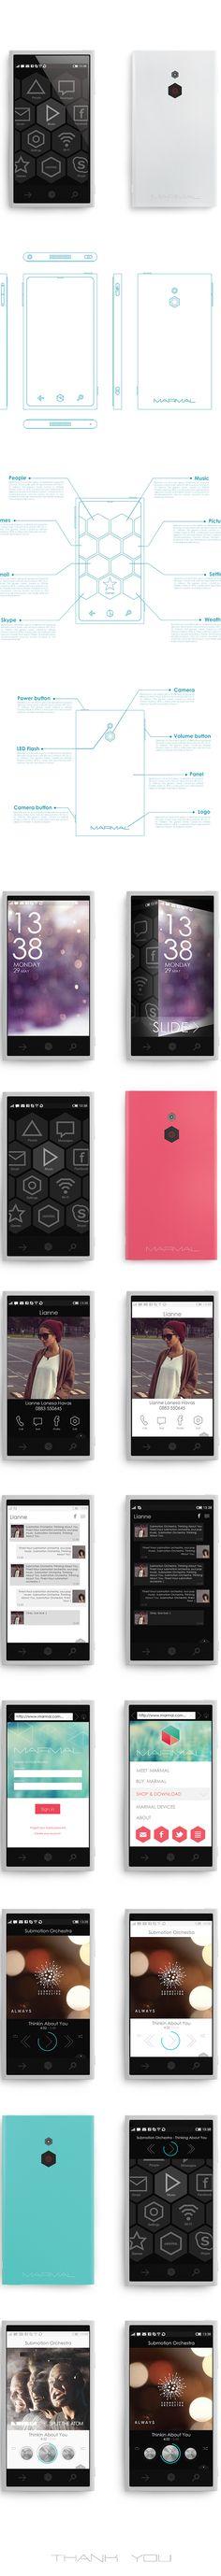 Mobile Software Marmal | Designer: Monika Kusheva